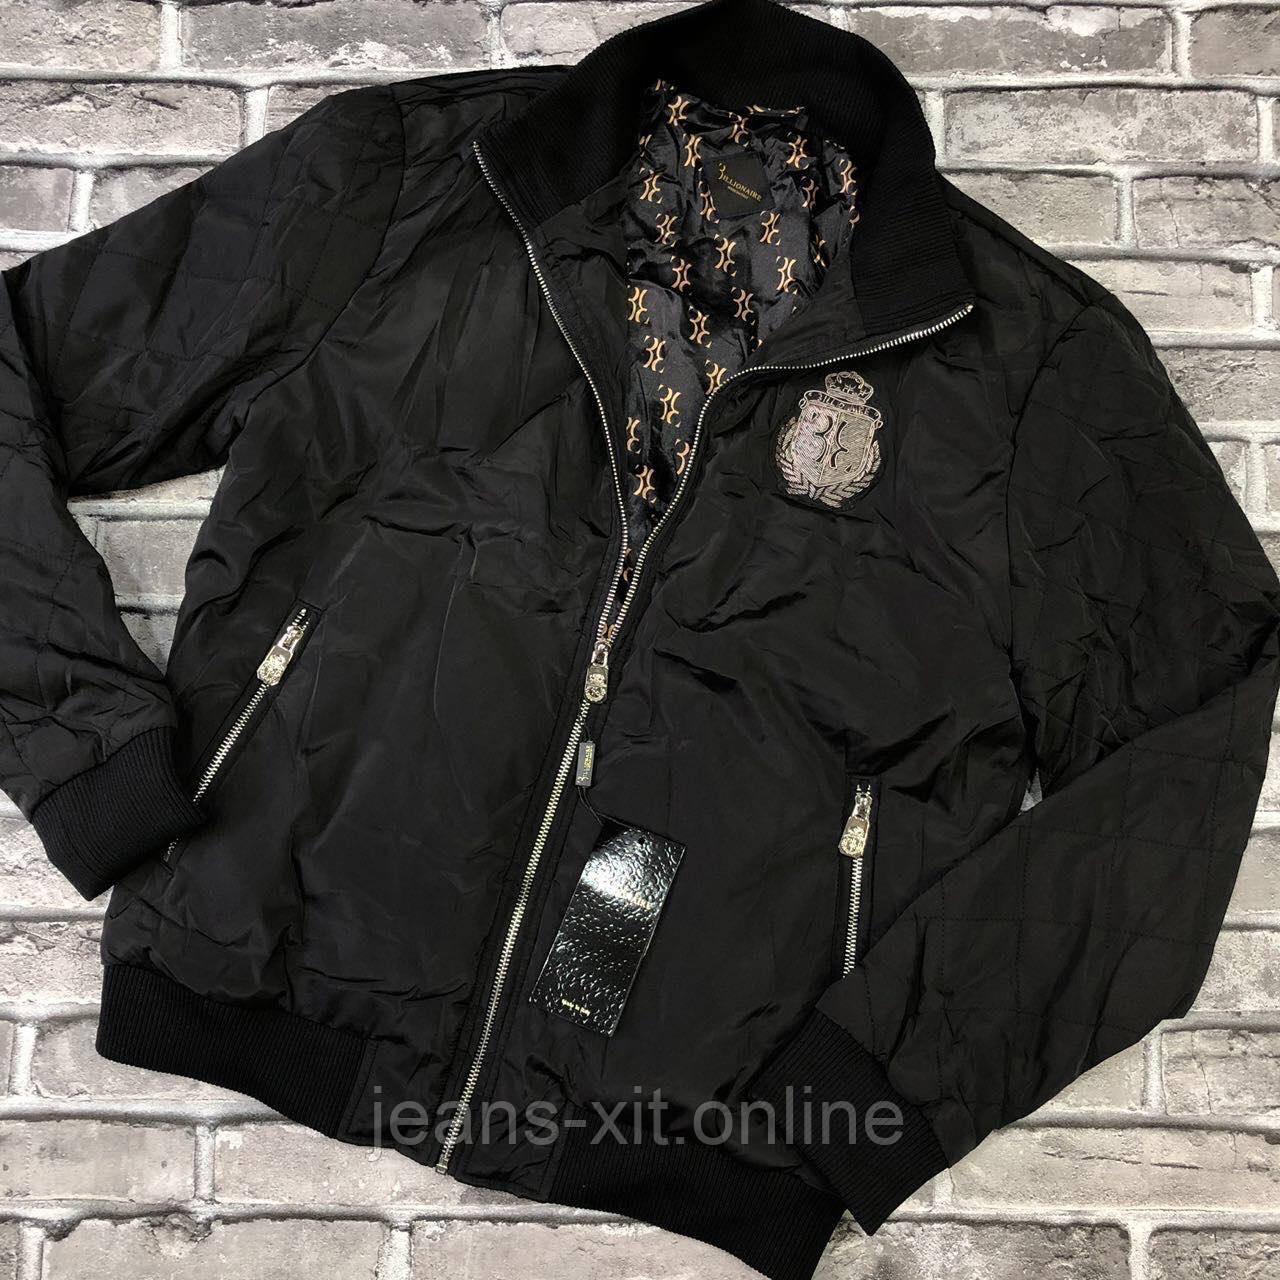 Куртка Чол. 52(р) чорний 2020966-1 Billionaire Туреччина Осінь-B